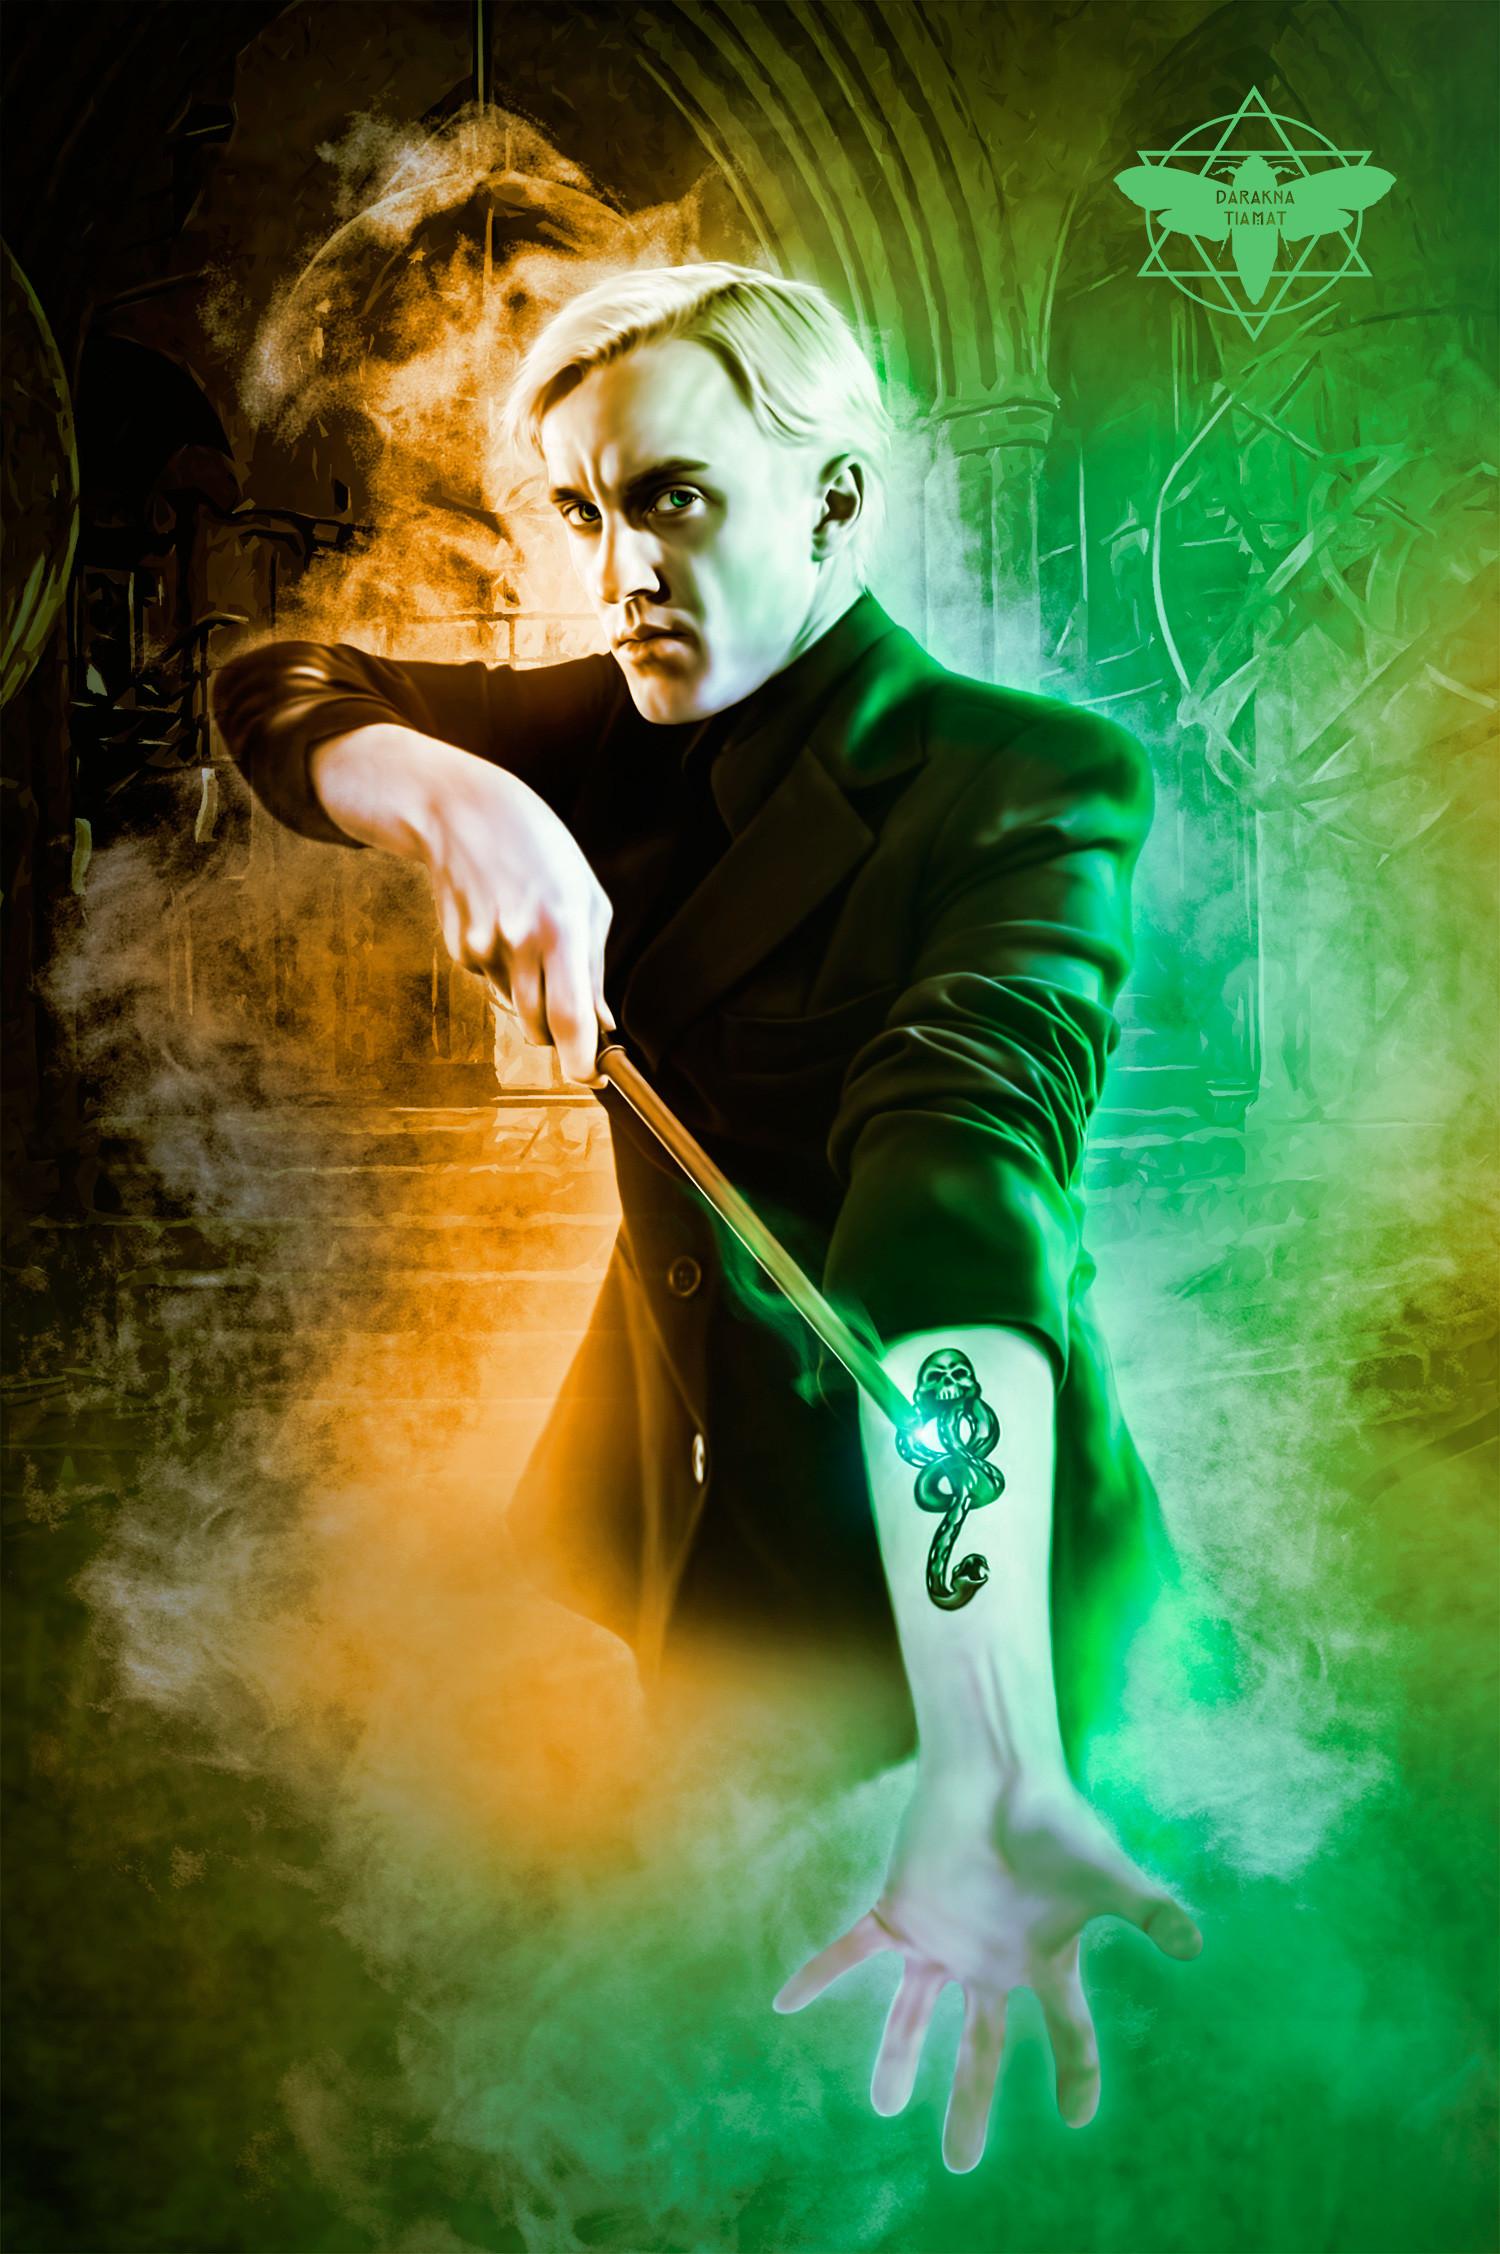 Artstation Tom Felton As Draco Malfoy Darakna Tiamat